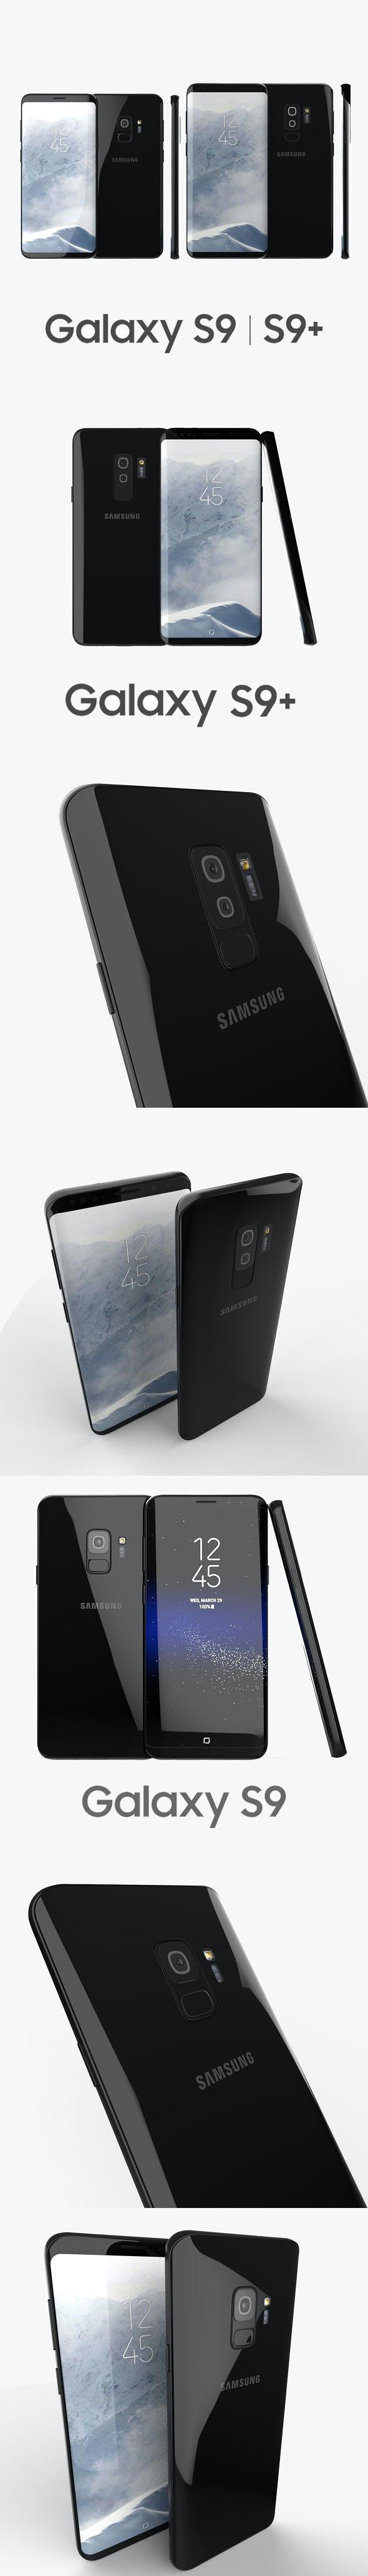 Samsung Galaxy S9, S9+ Black - 3DOcean Item for Sale